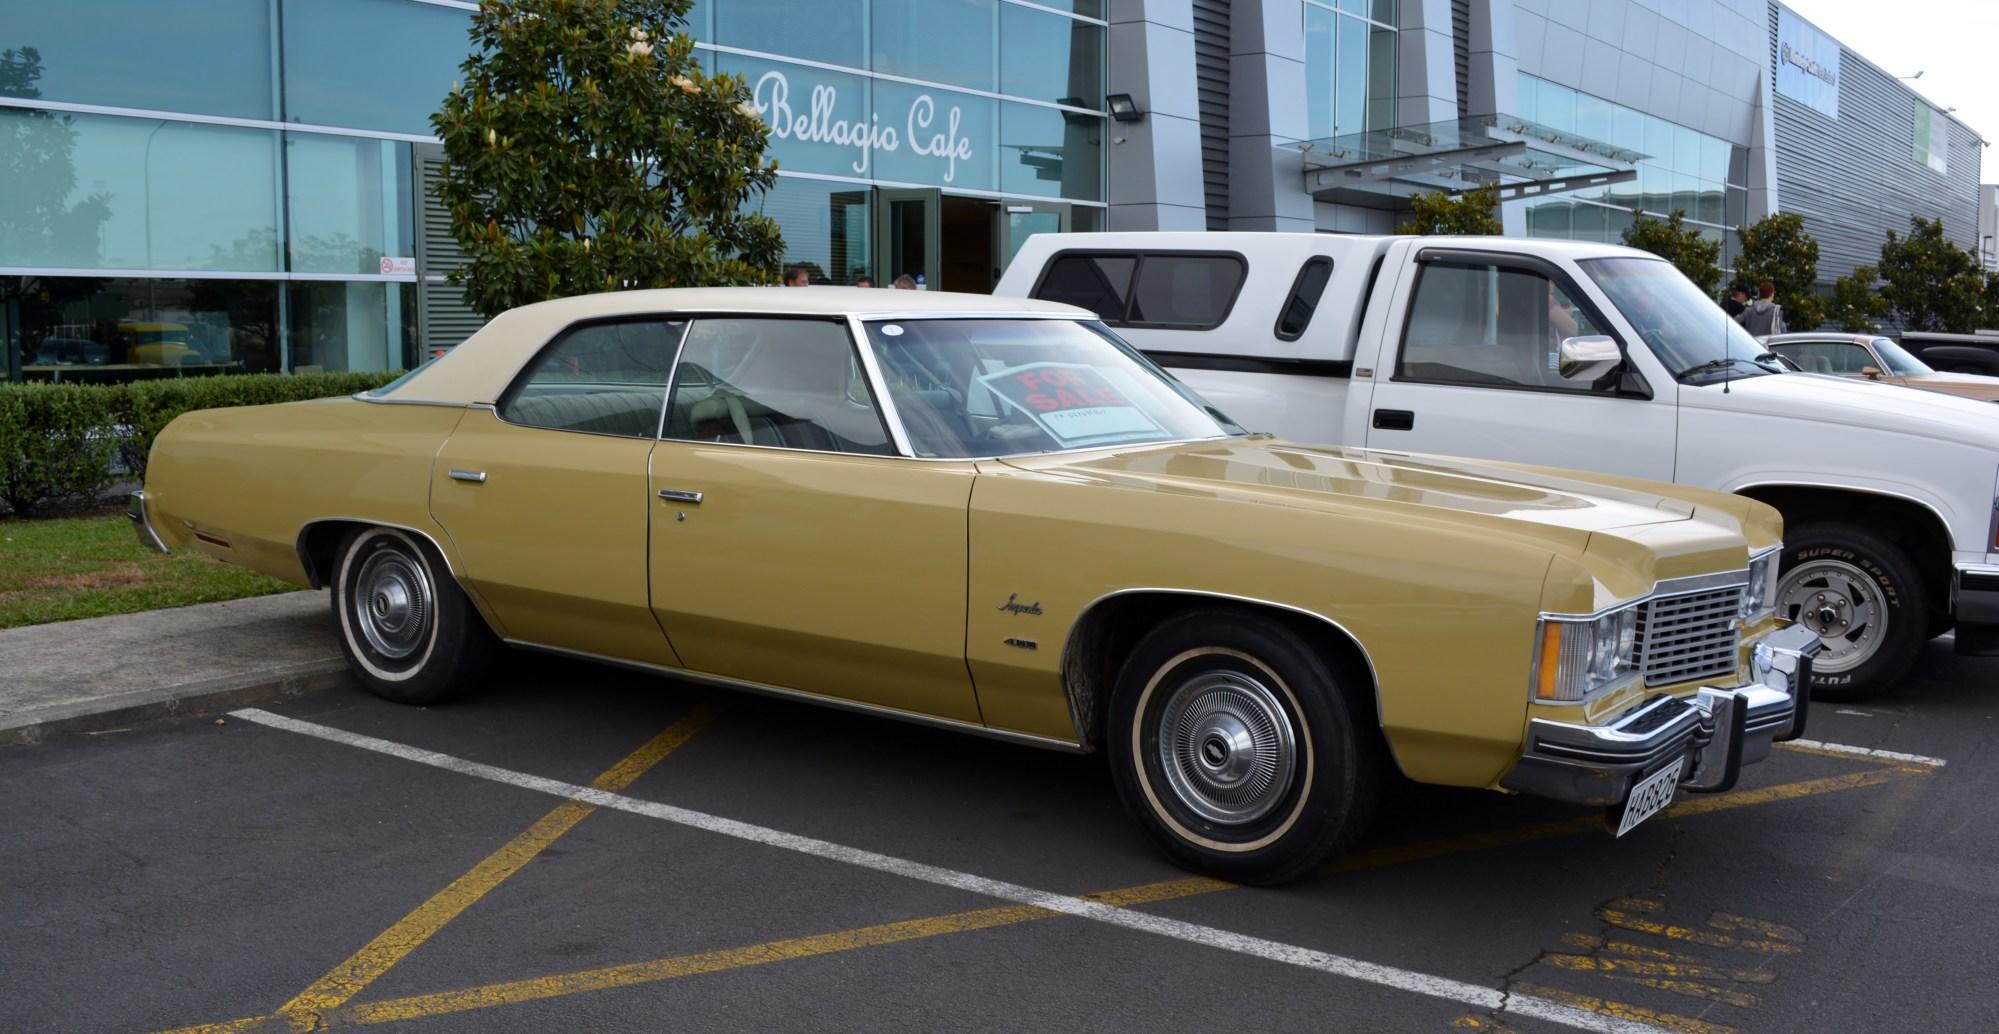 hight resolution of file 1974 chevrolet impala 11146054173 jpg